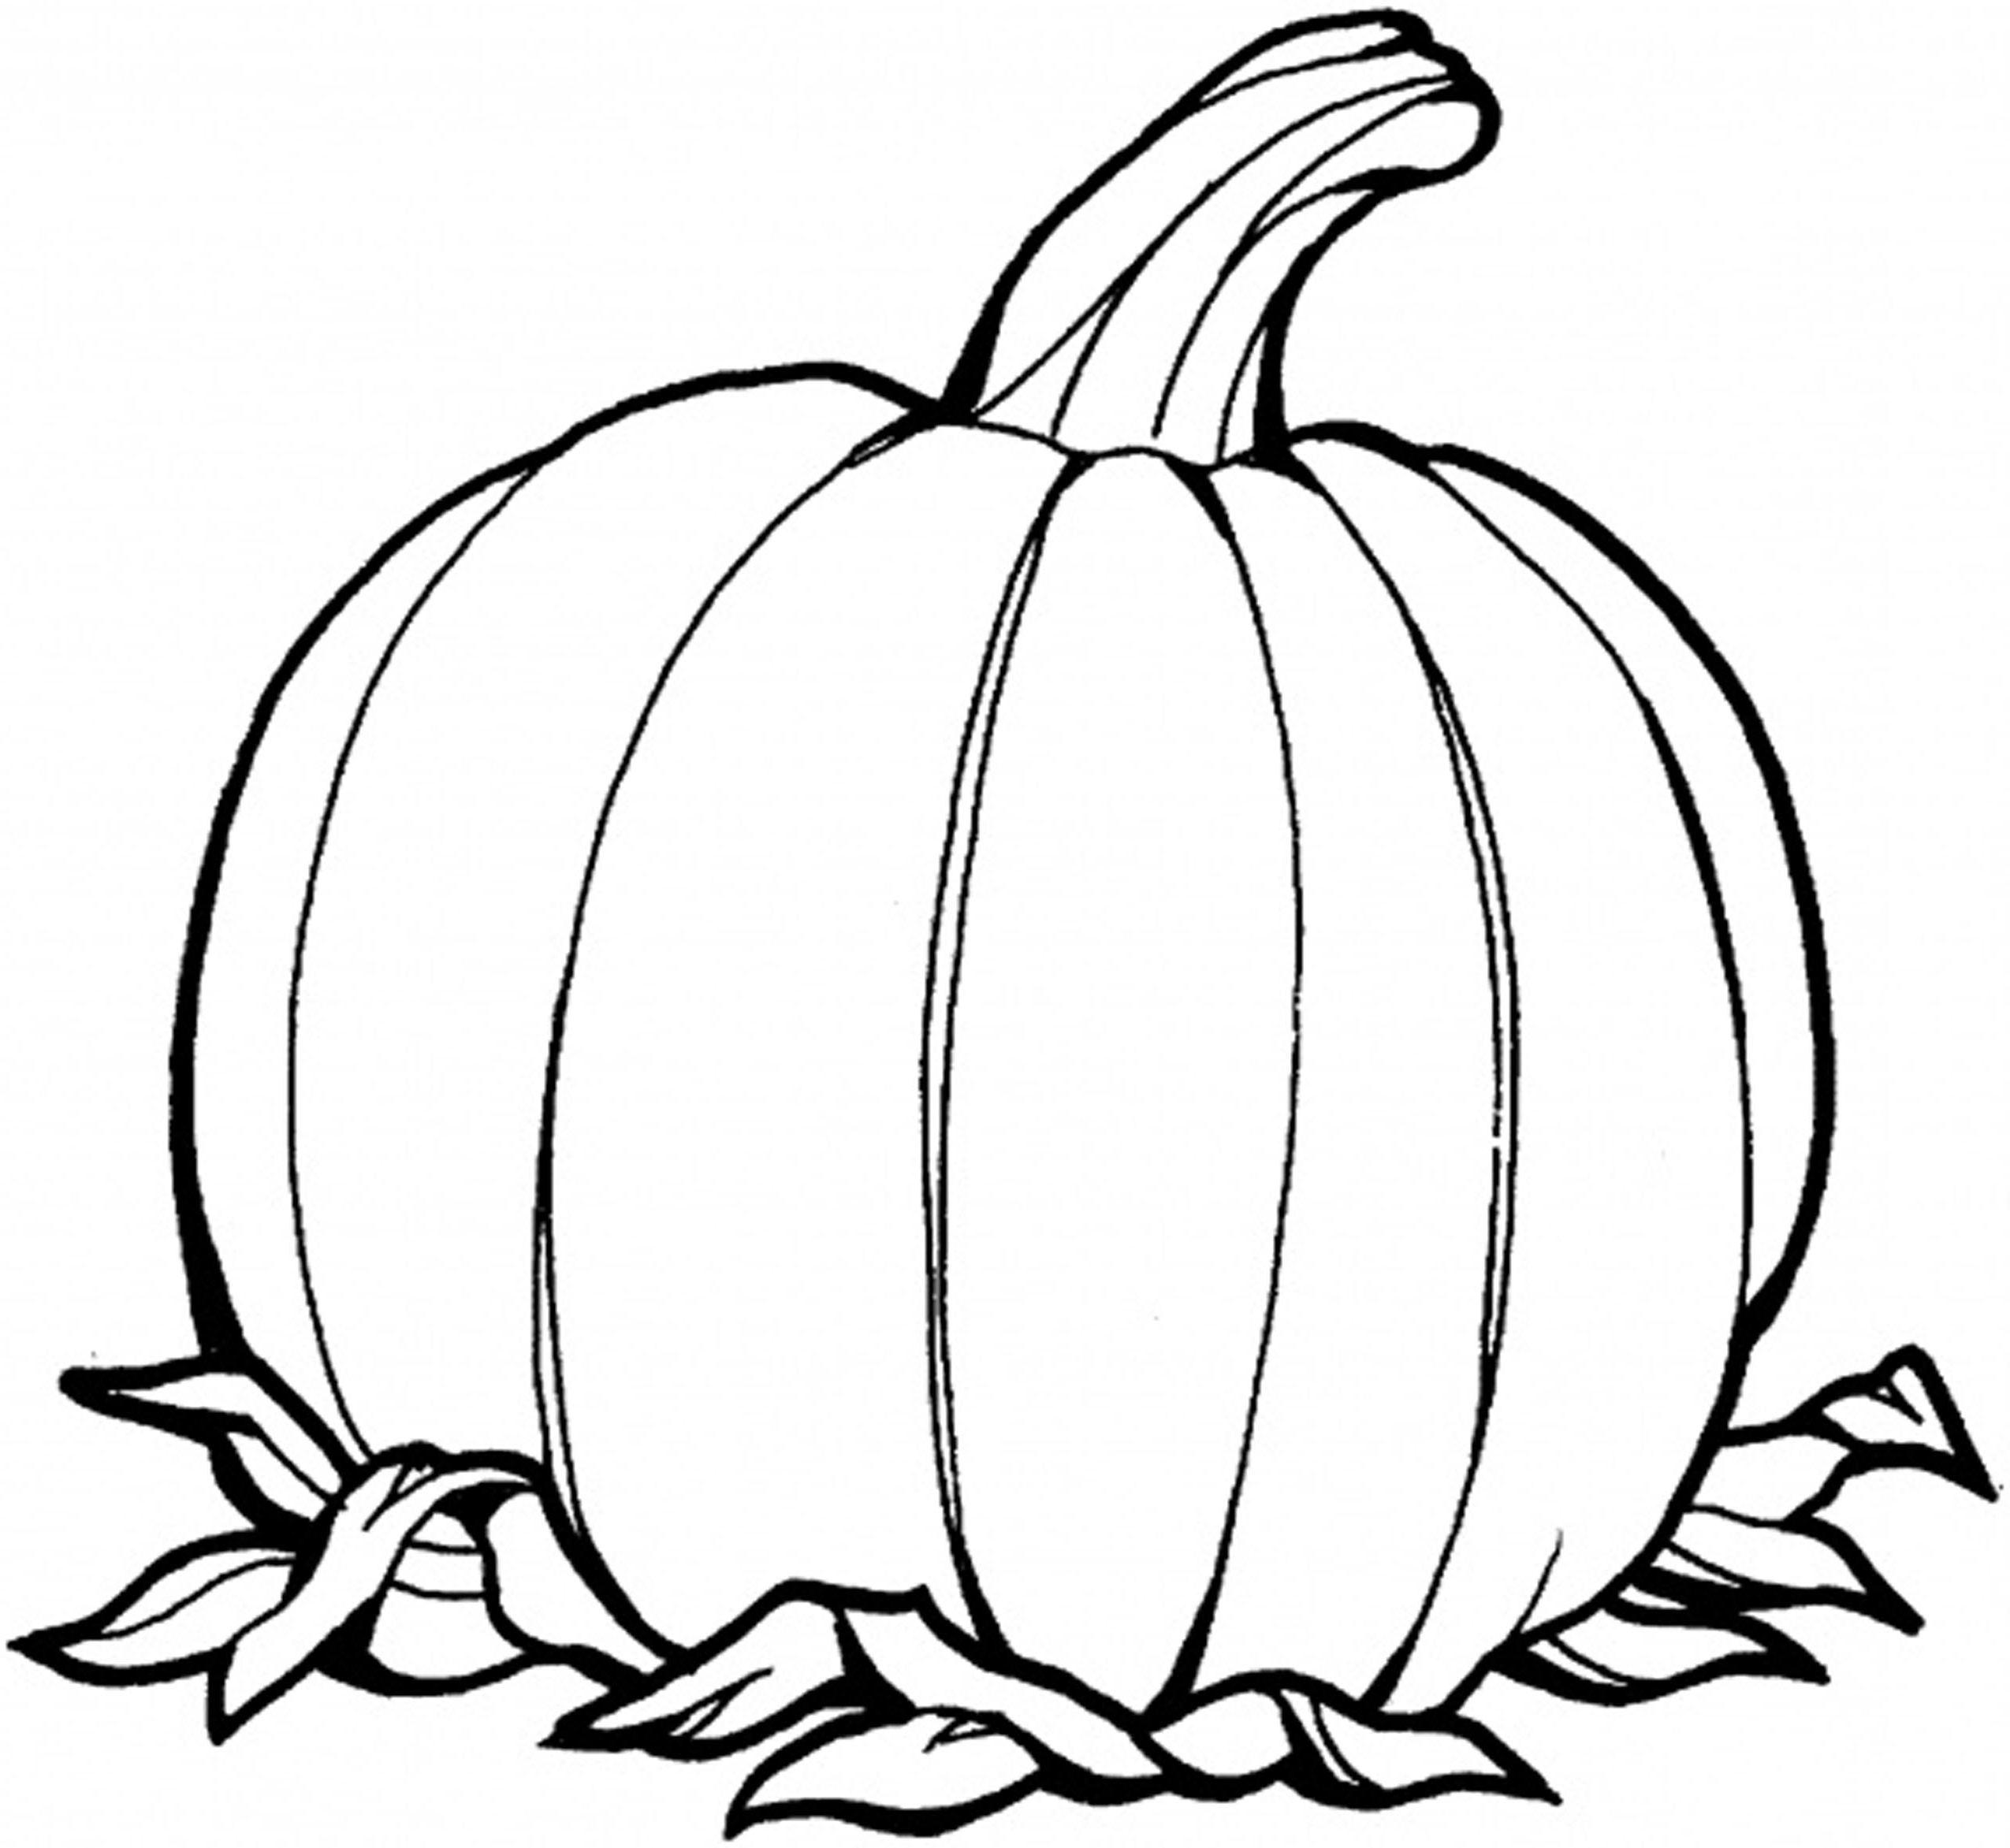 2550x2345 Pumpkin Drawing For Kids Coloring Page Pumpkin Sheets Printable